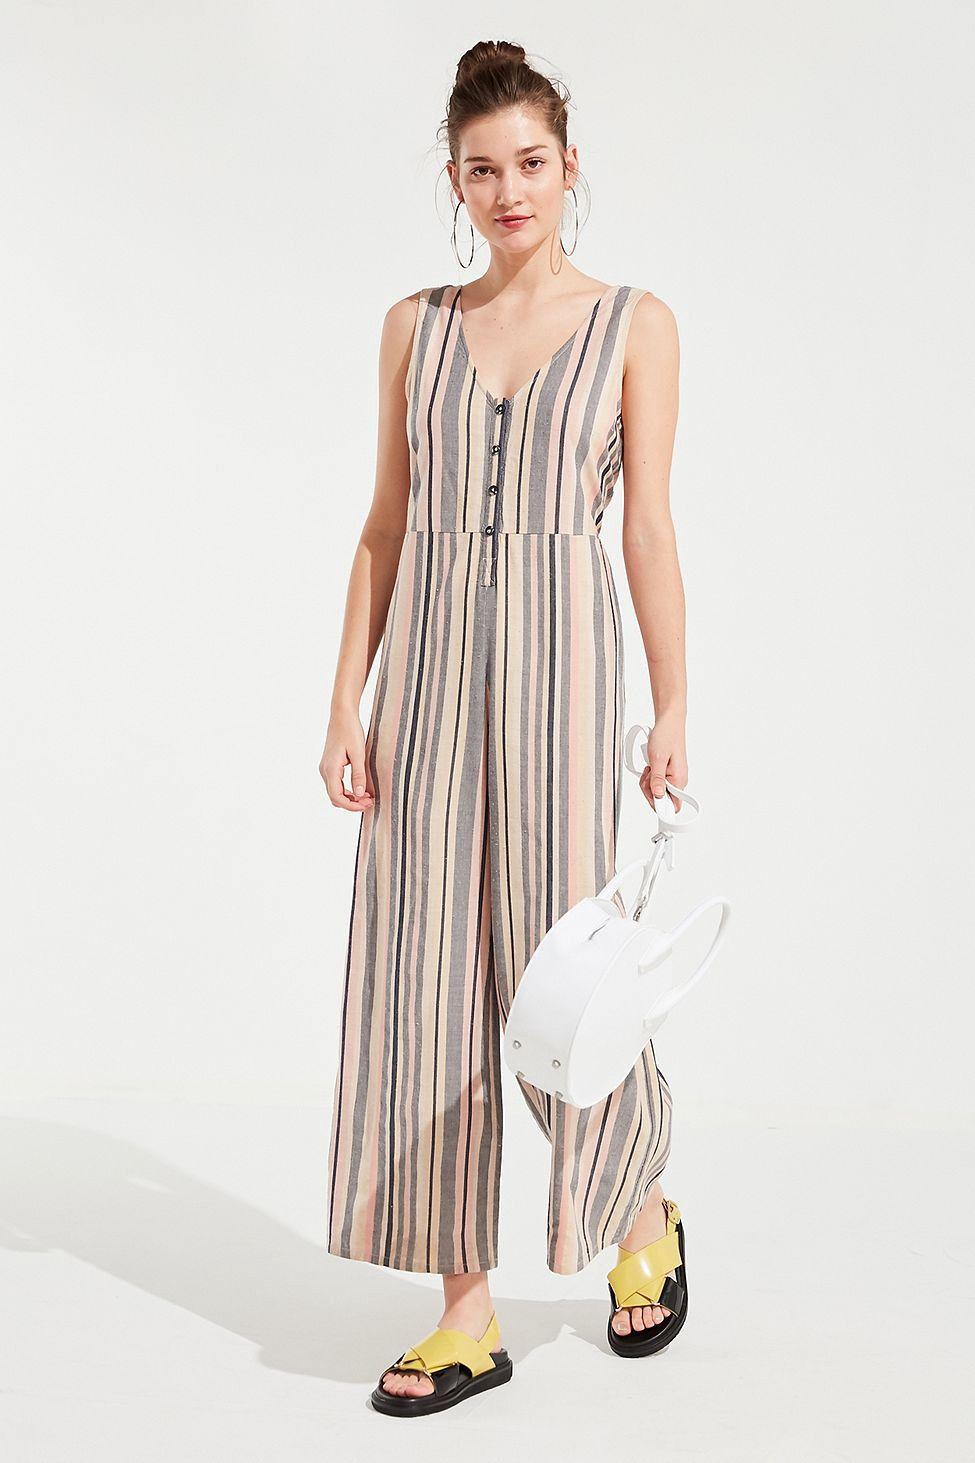 d214d1899d7a Urban Outfitters Uo Sage Striped Button-Down Jumpsuit - Multi ...